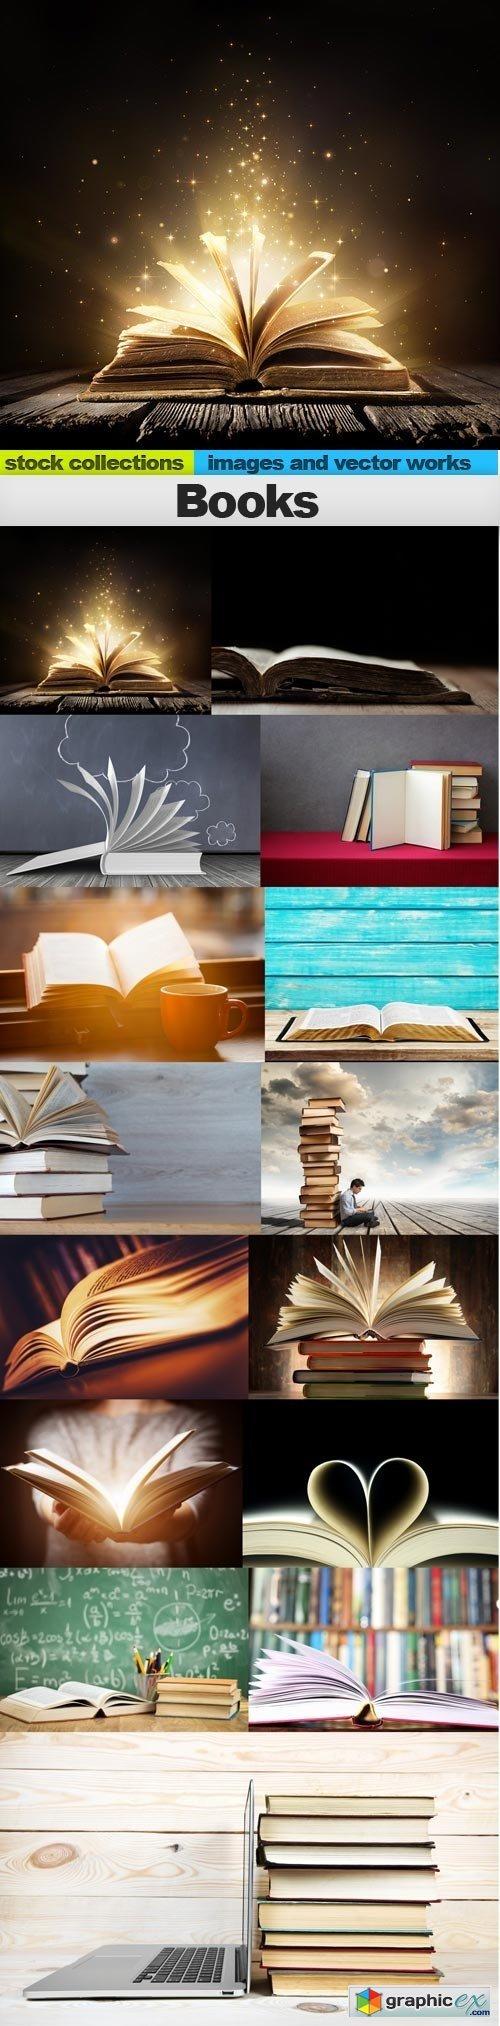 Books, 15 x UHQ JPEG